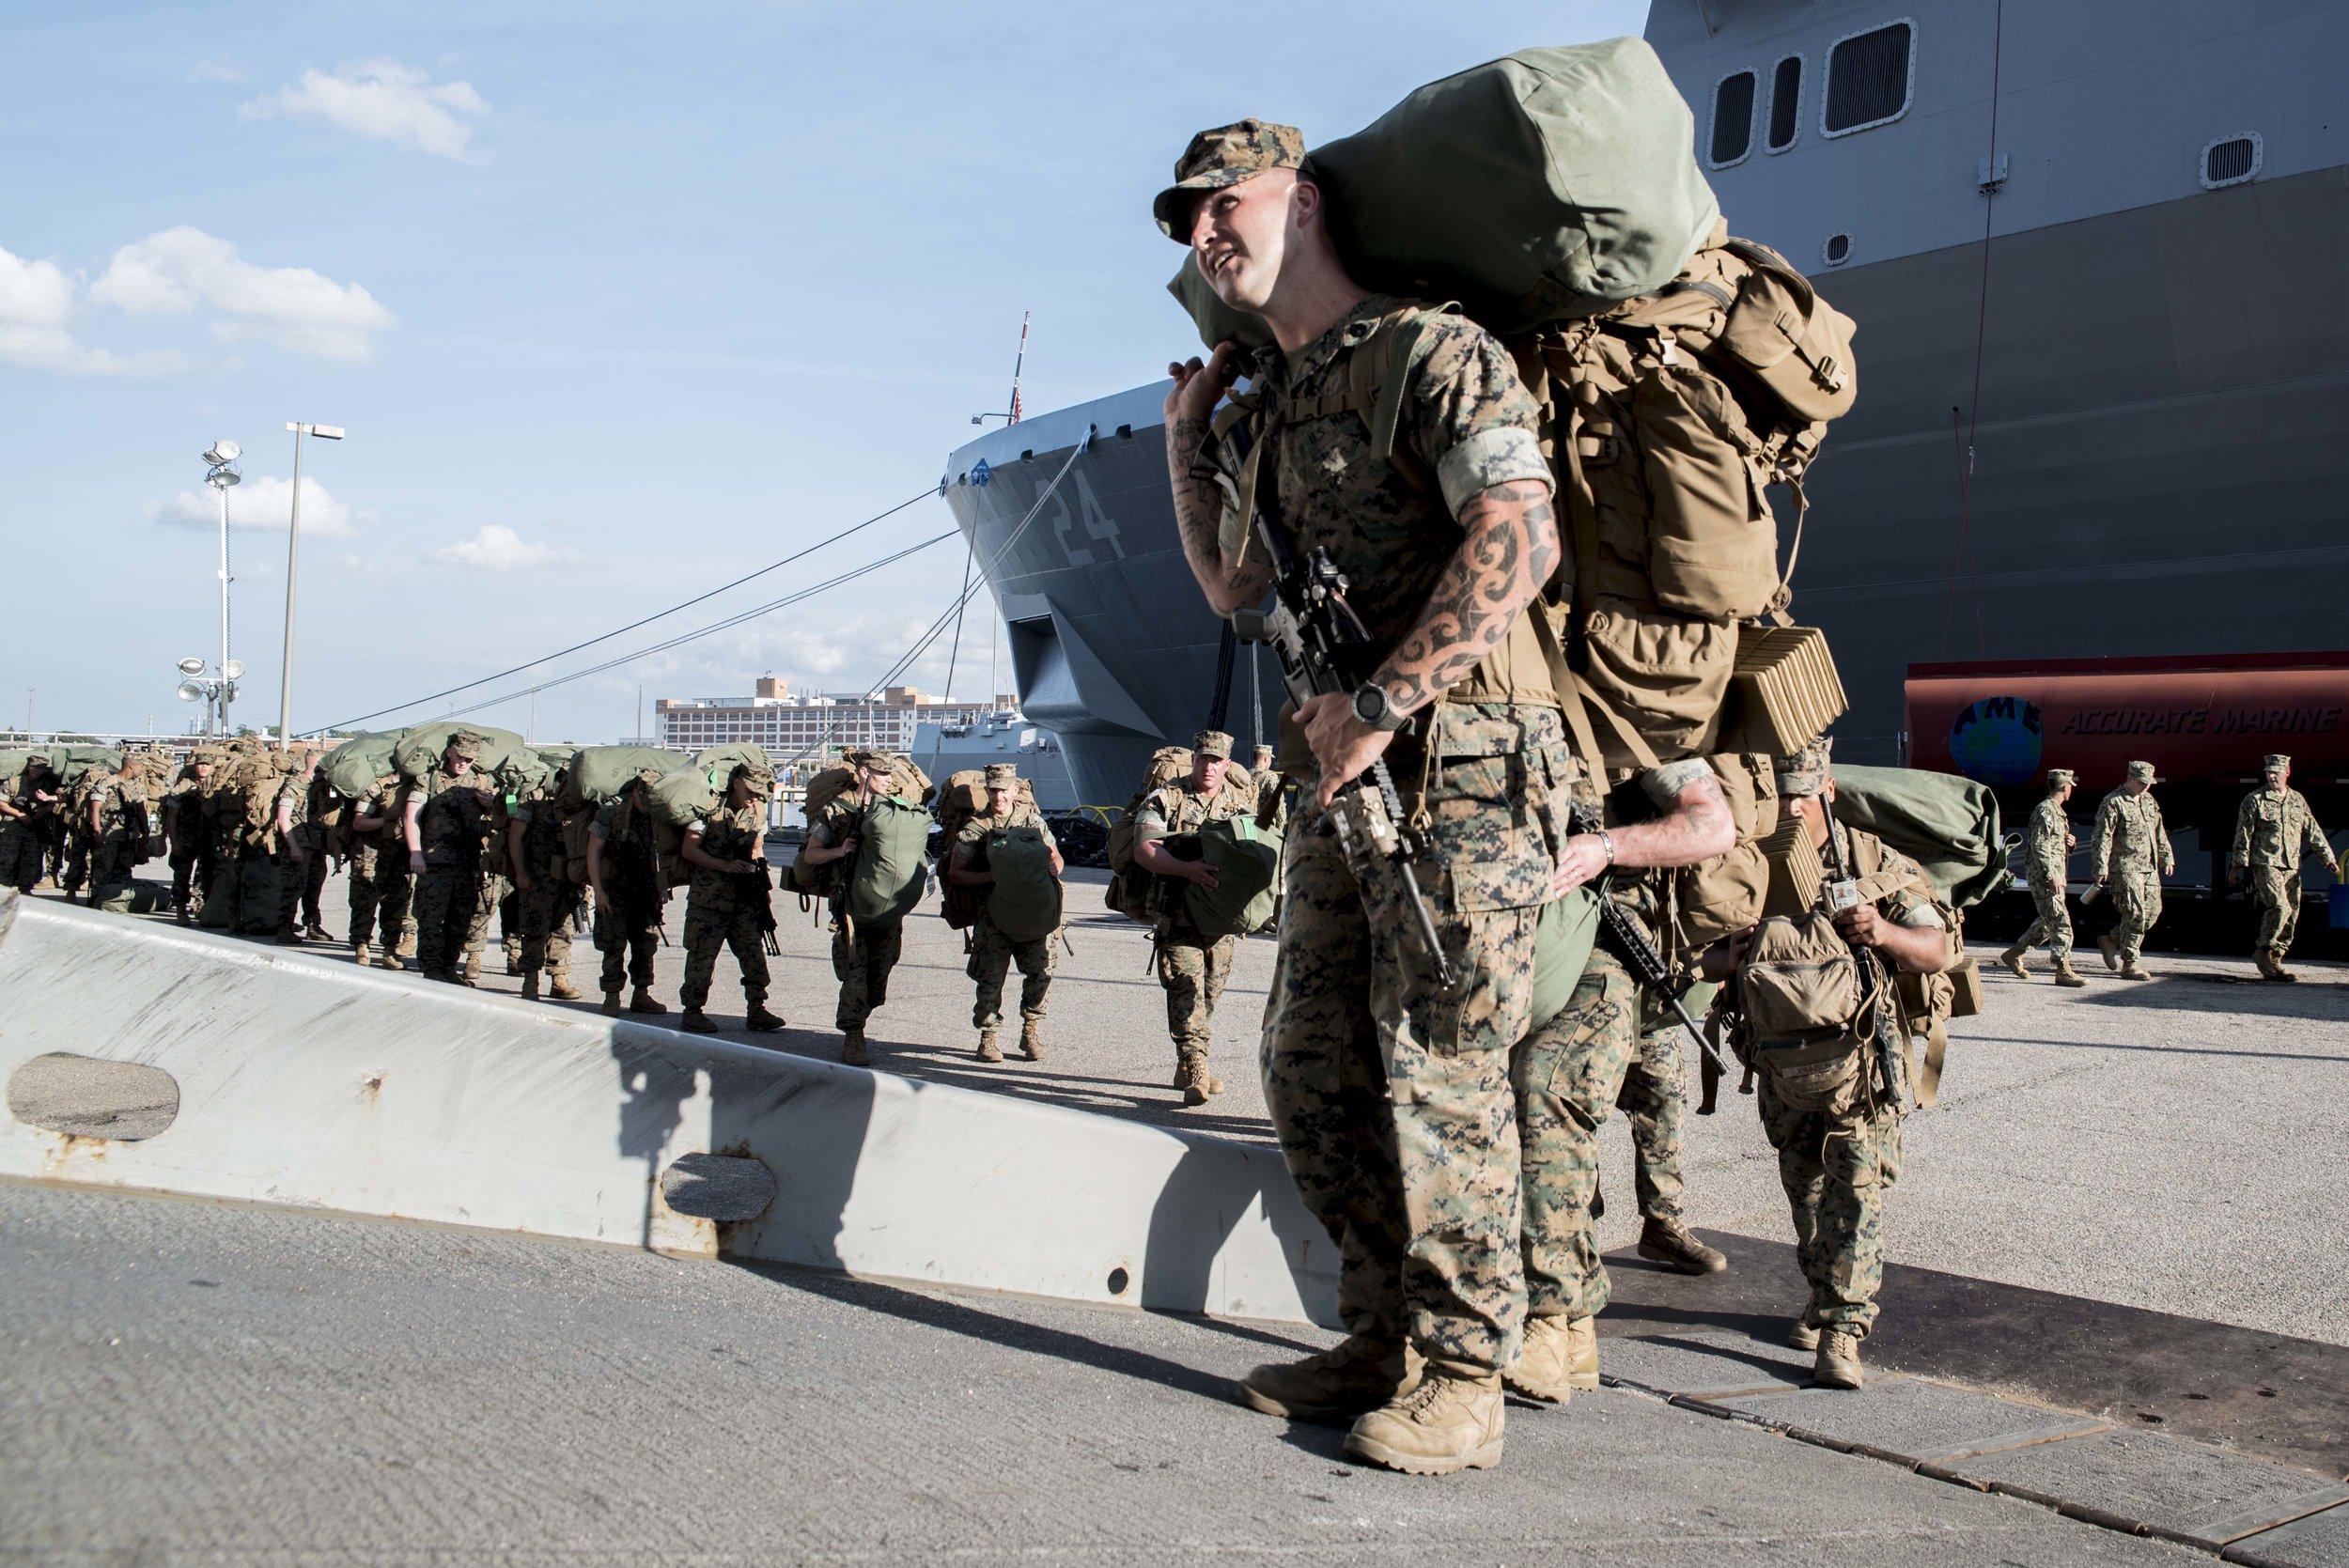 U.S. Navy photo by Mass Communication Specialist 1st Class Deven B. King (Released) 2017/08/30